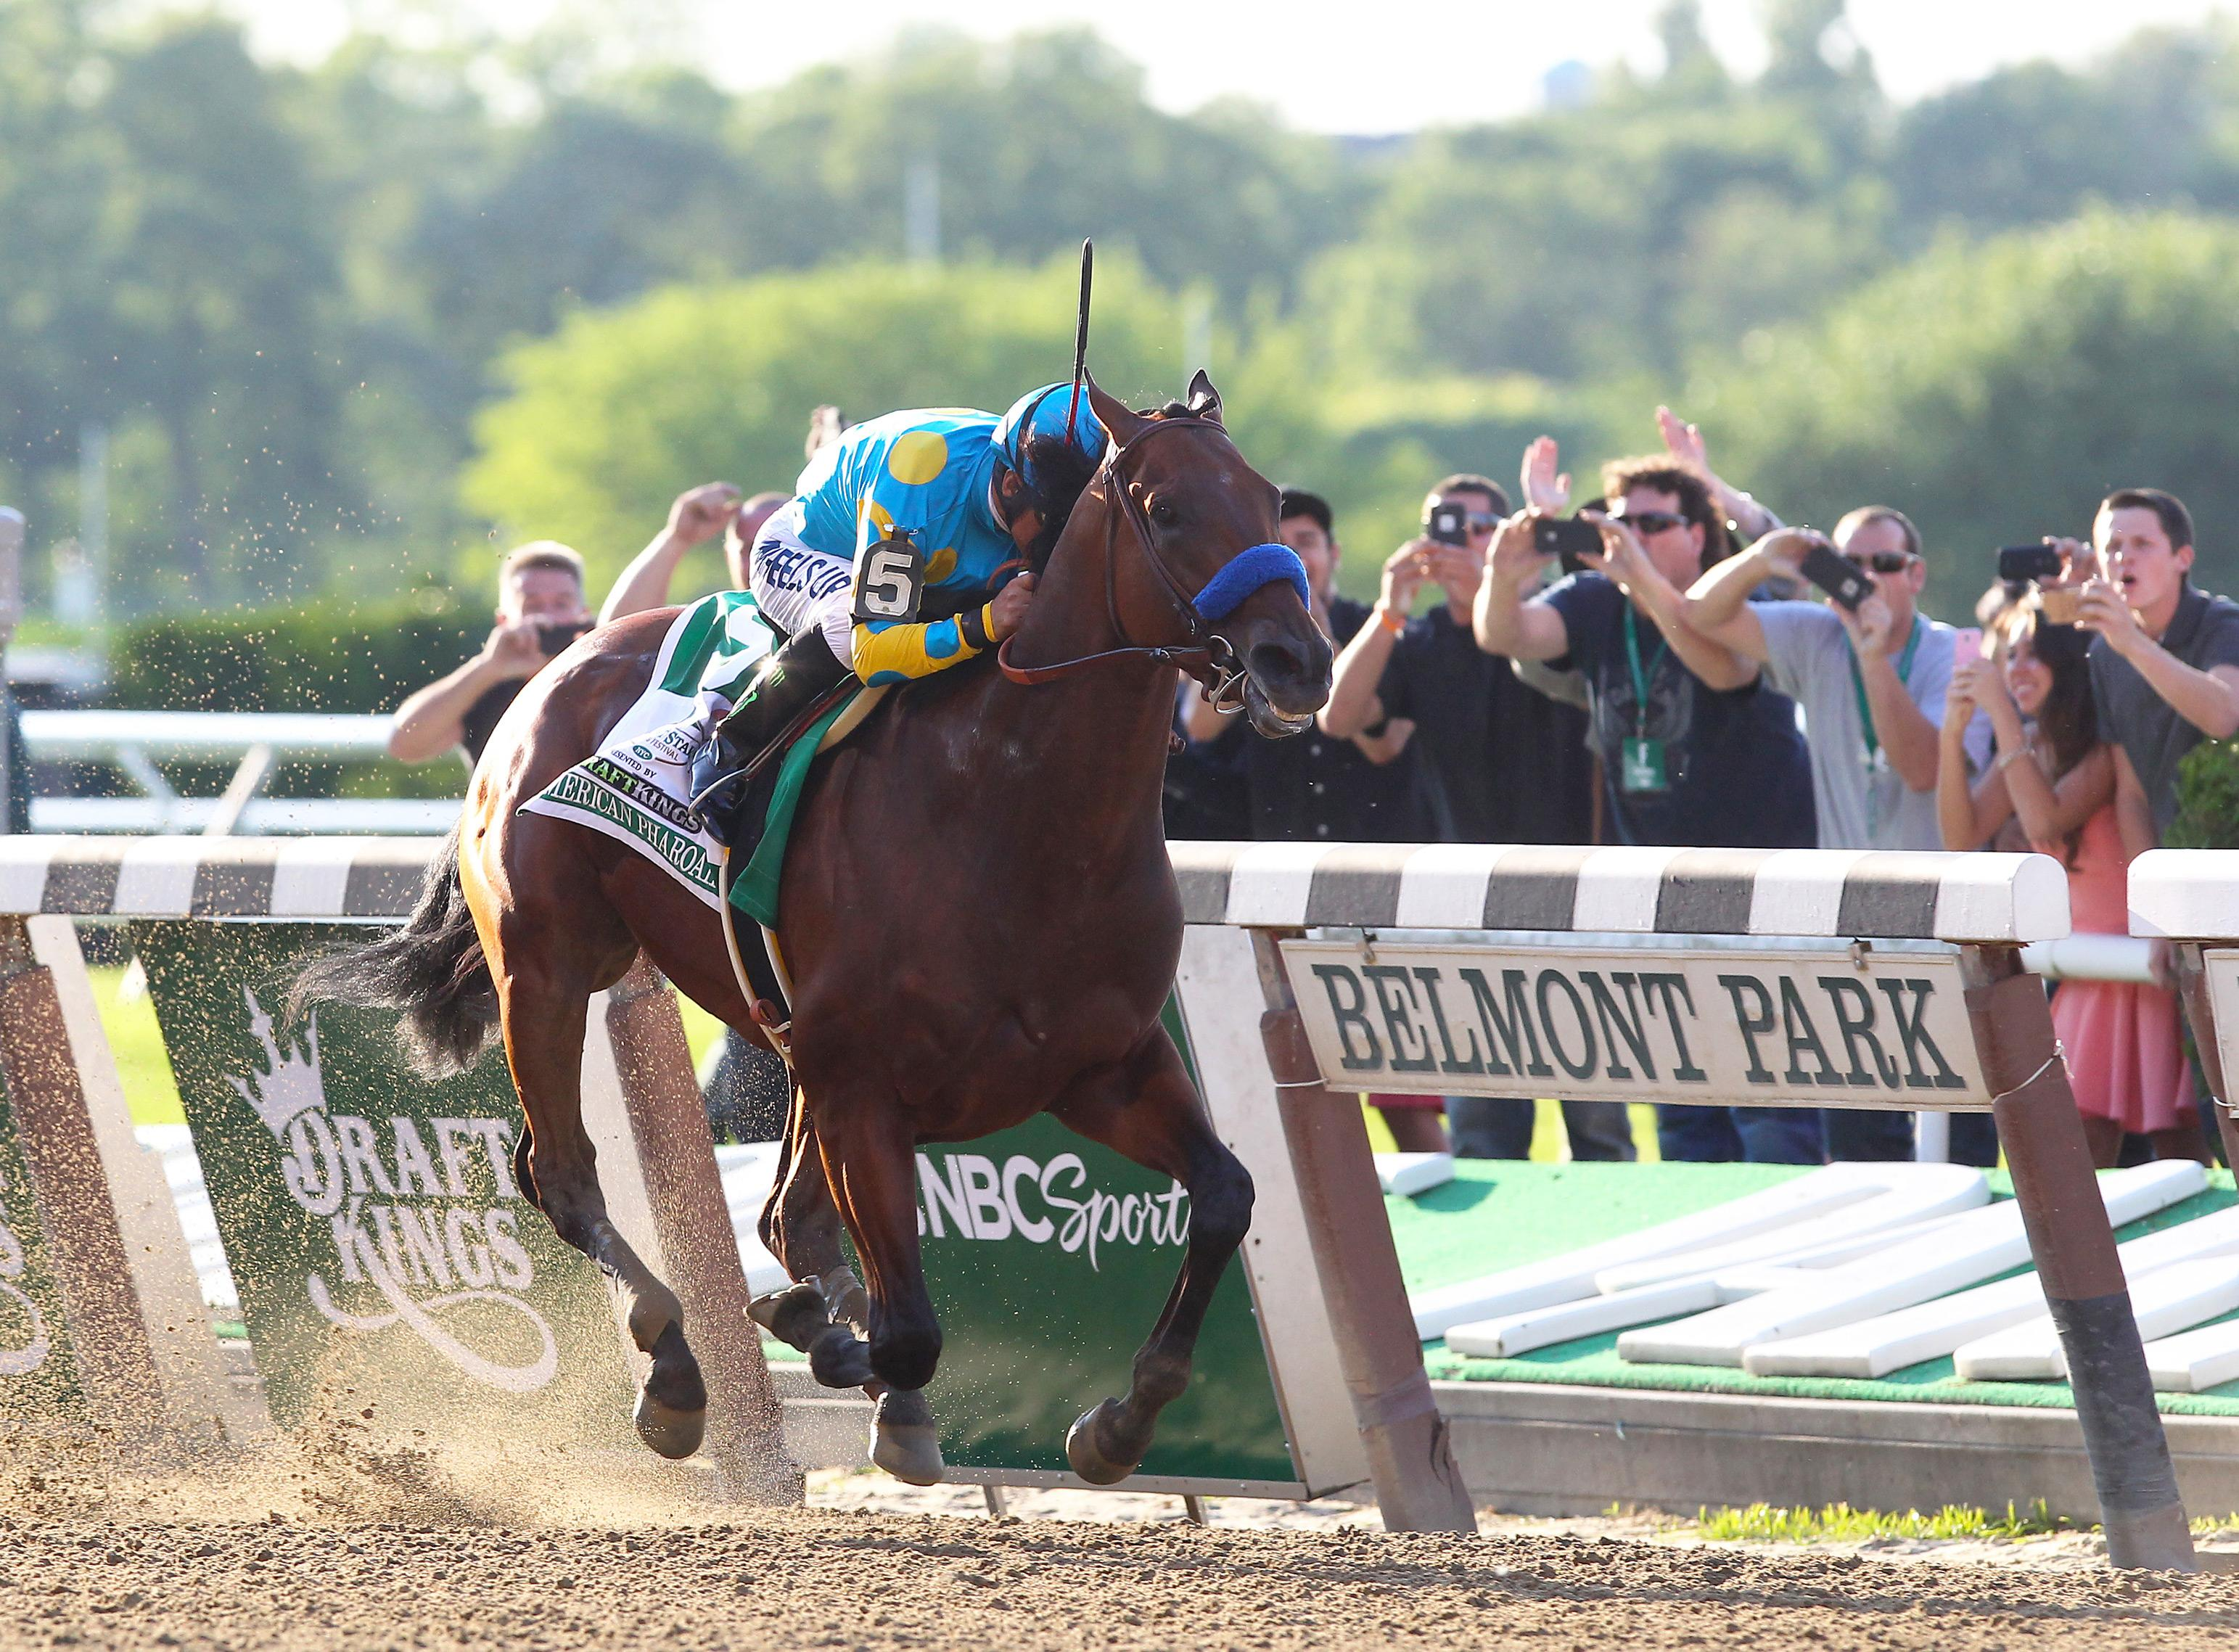 American Pharoah wins the Belmont Stakes.